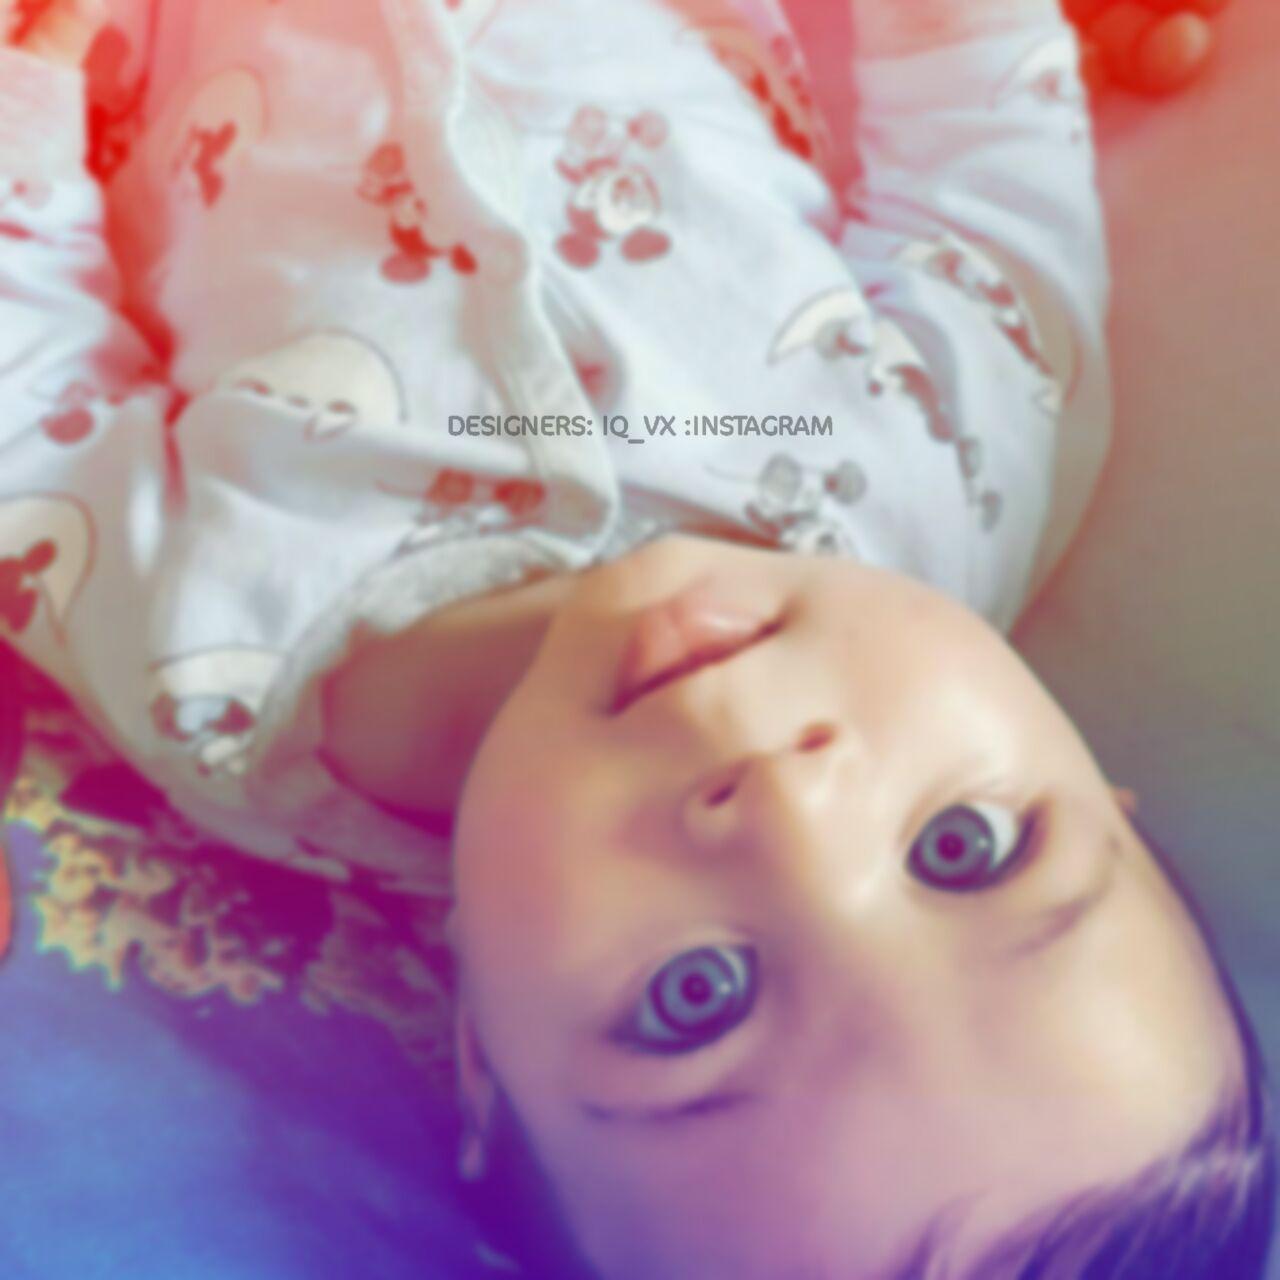 بنات صور جميلات سناب جات صور بنات رمزيات بنات رمزيات صور سناب رمزيات محجبات Baby Face Boys Dpz Instagram